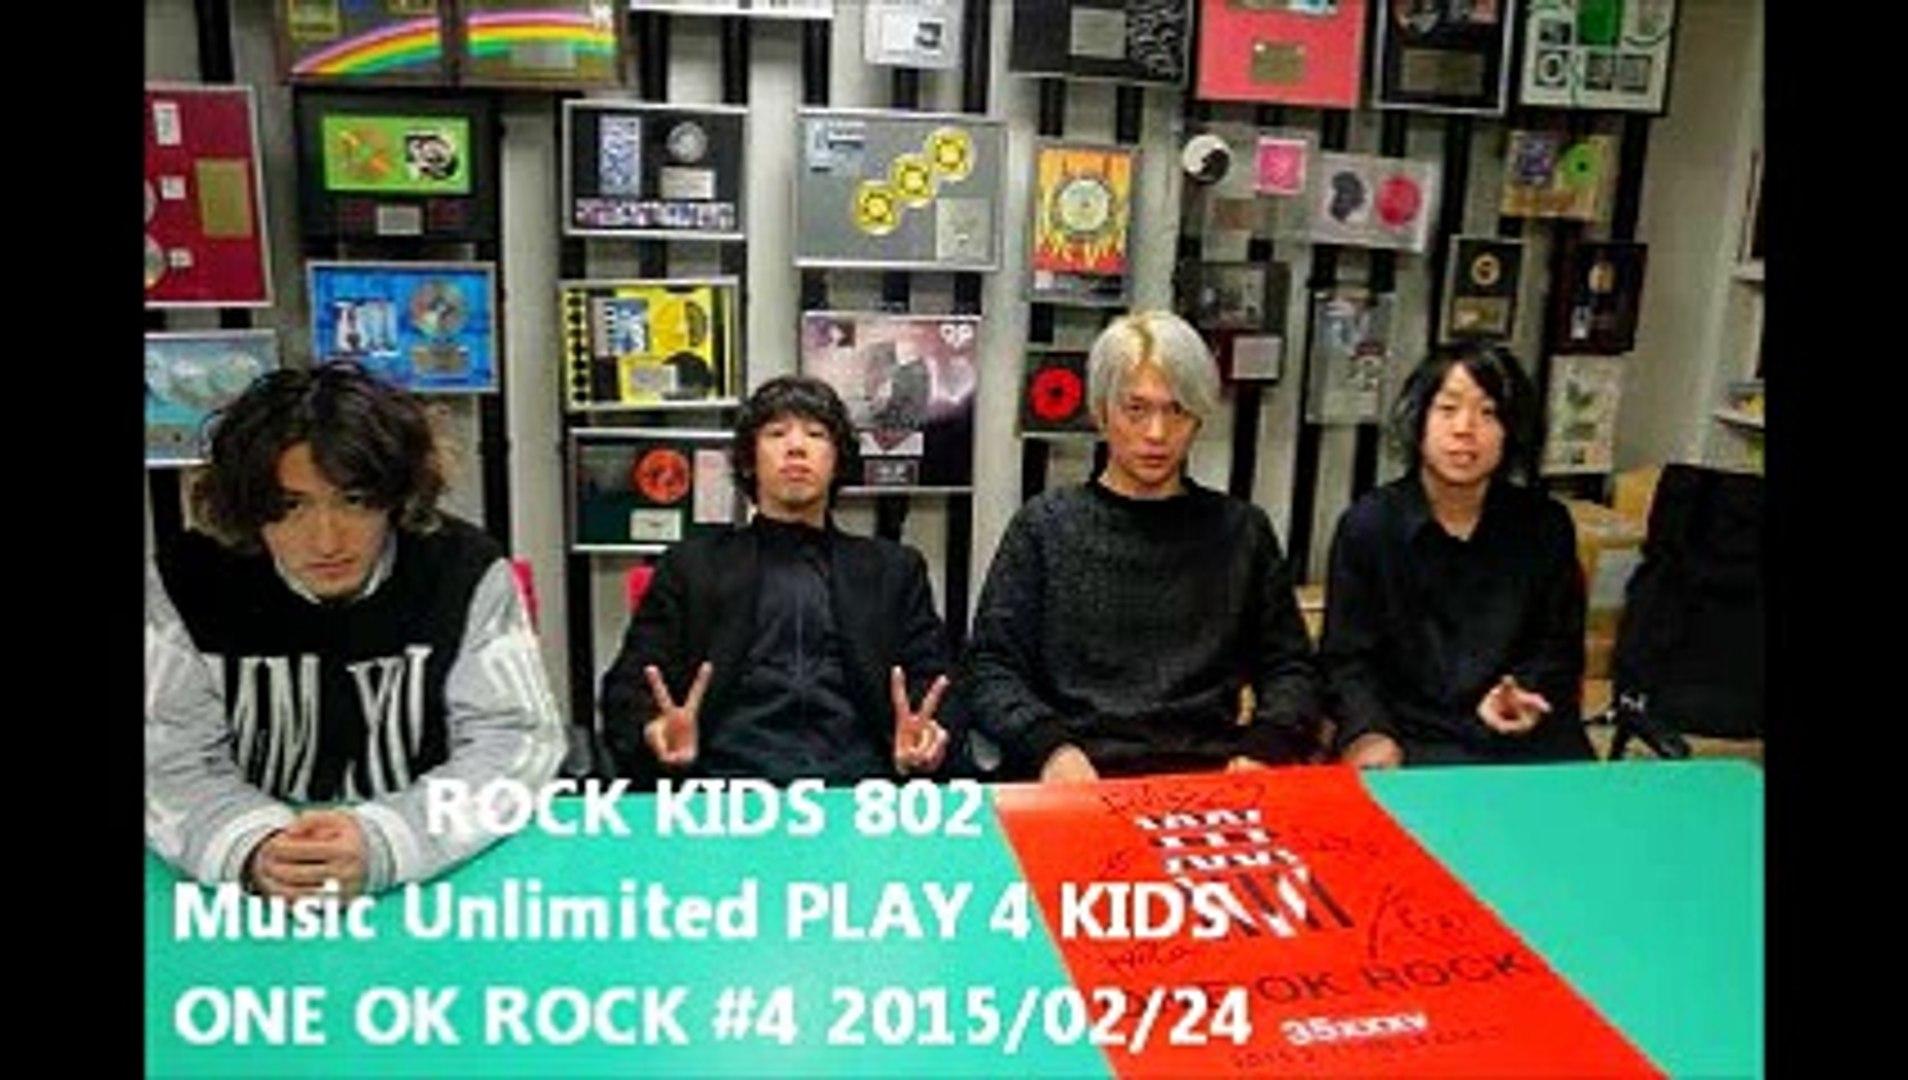 ROCK KIDS 802  PLAY 4 KIDS  ONE OK ROCK #4 2015/02/24